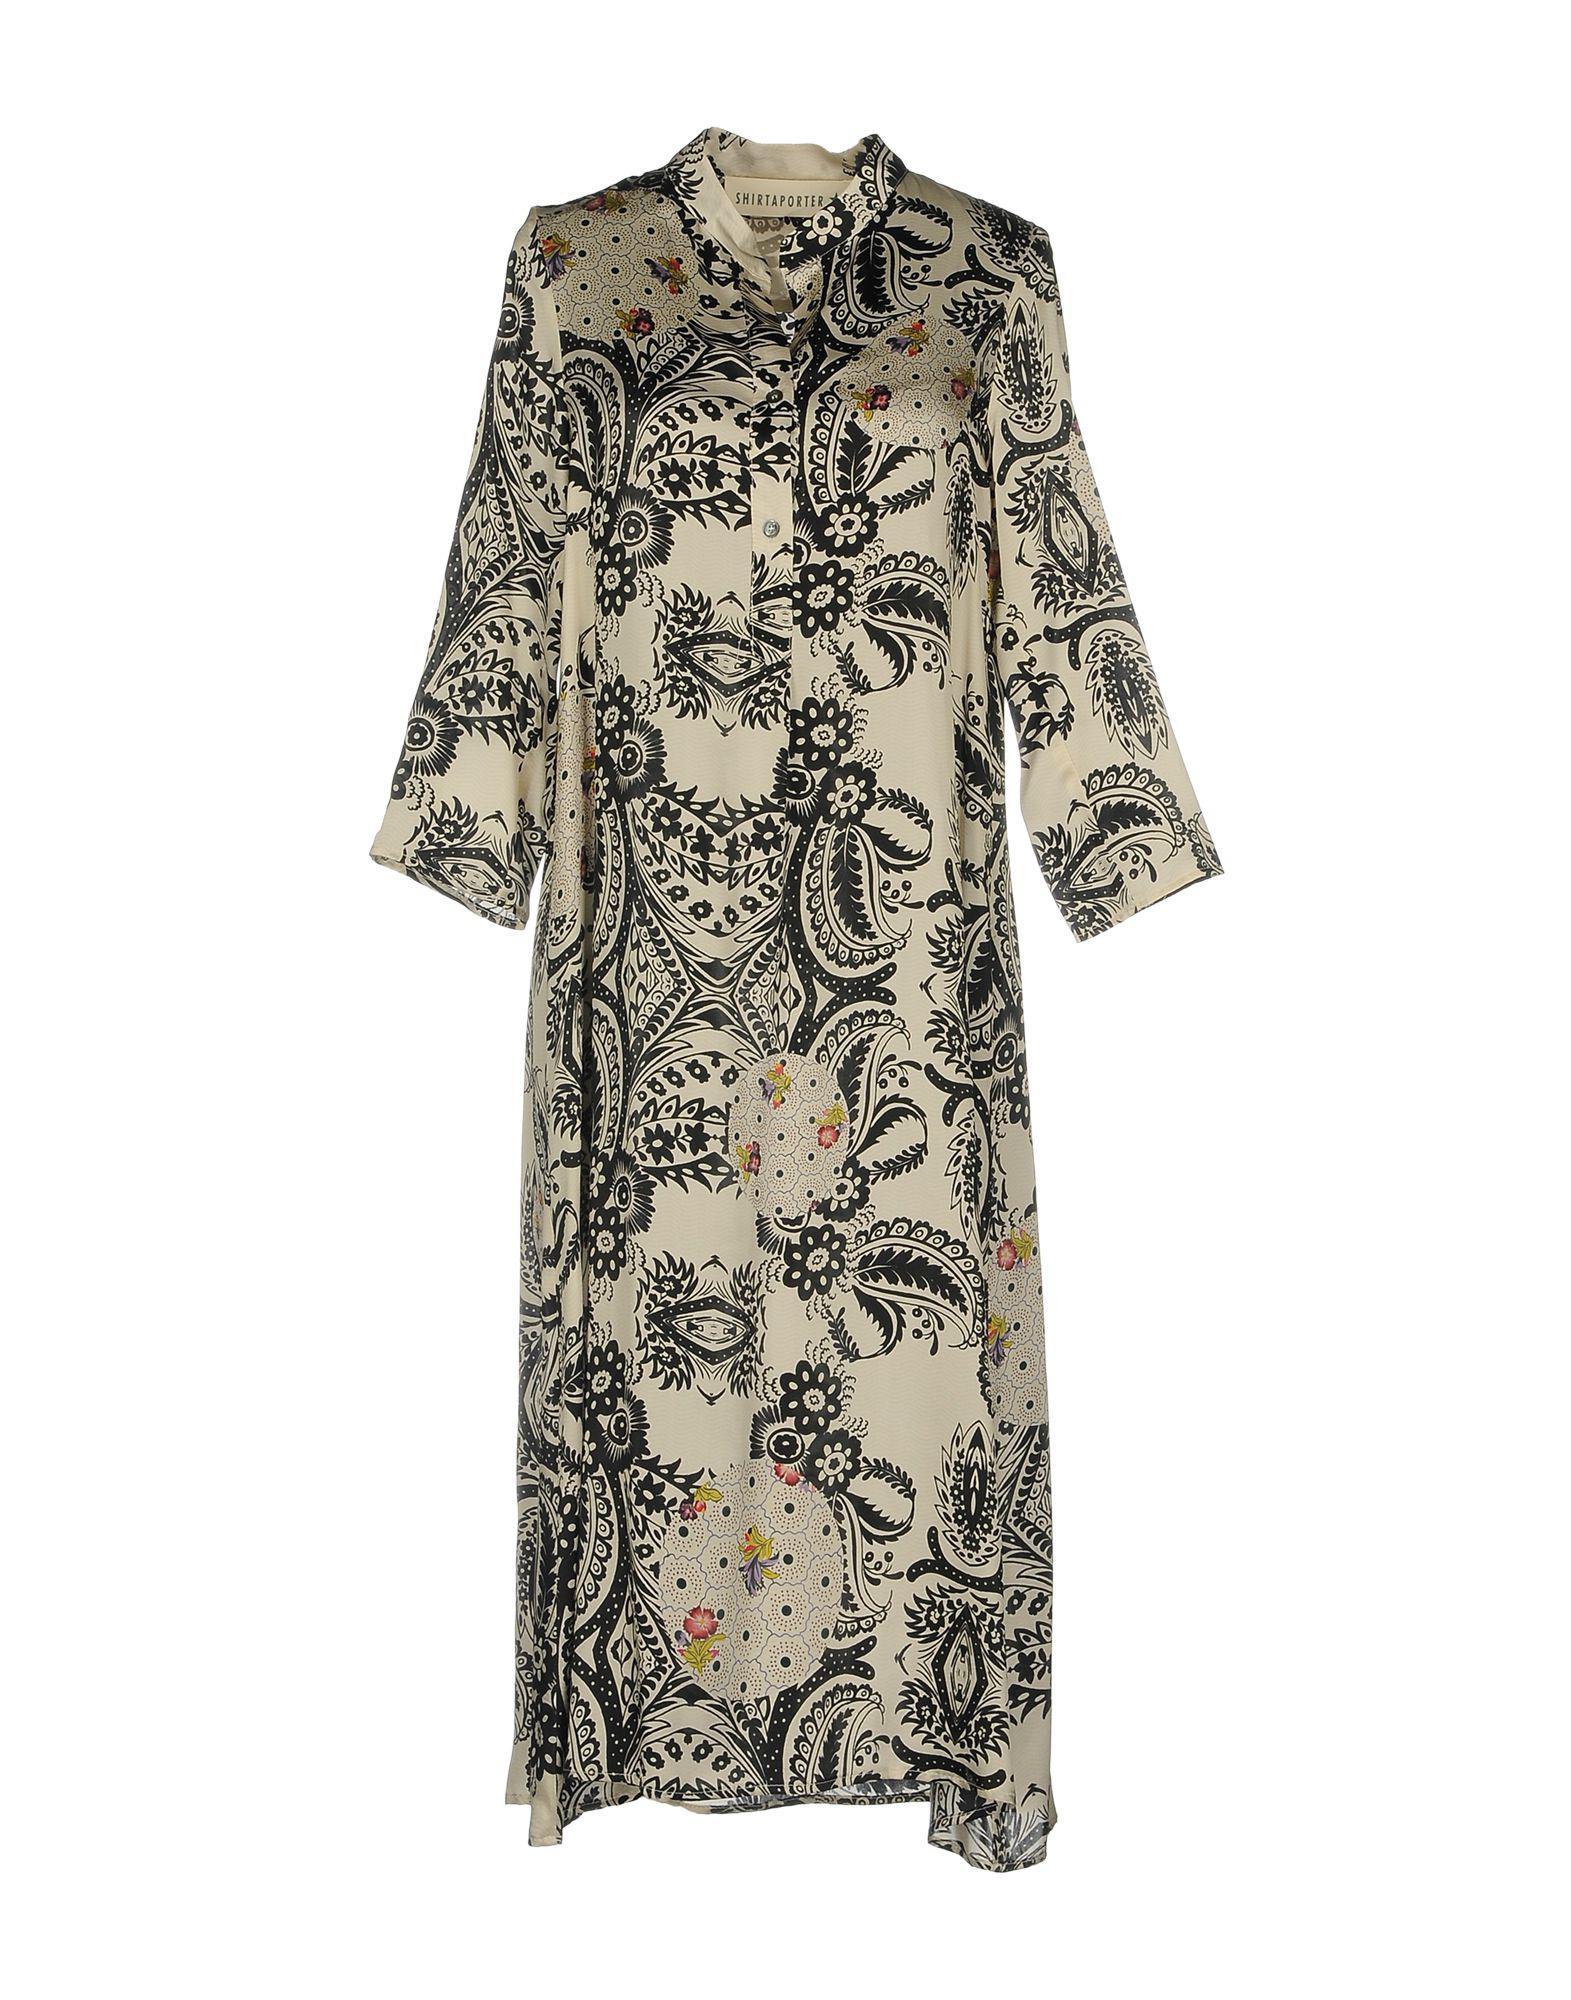 DRESSES - Knee-length dresses Shirtaporter tSZs5asaR